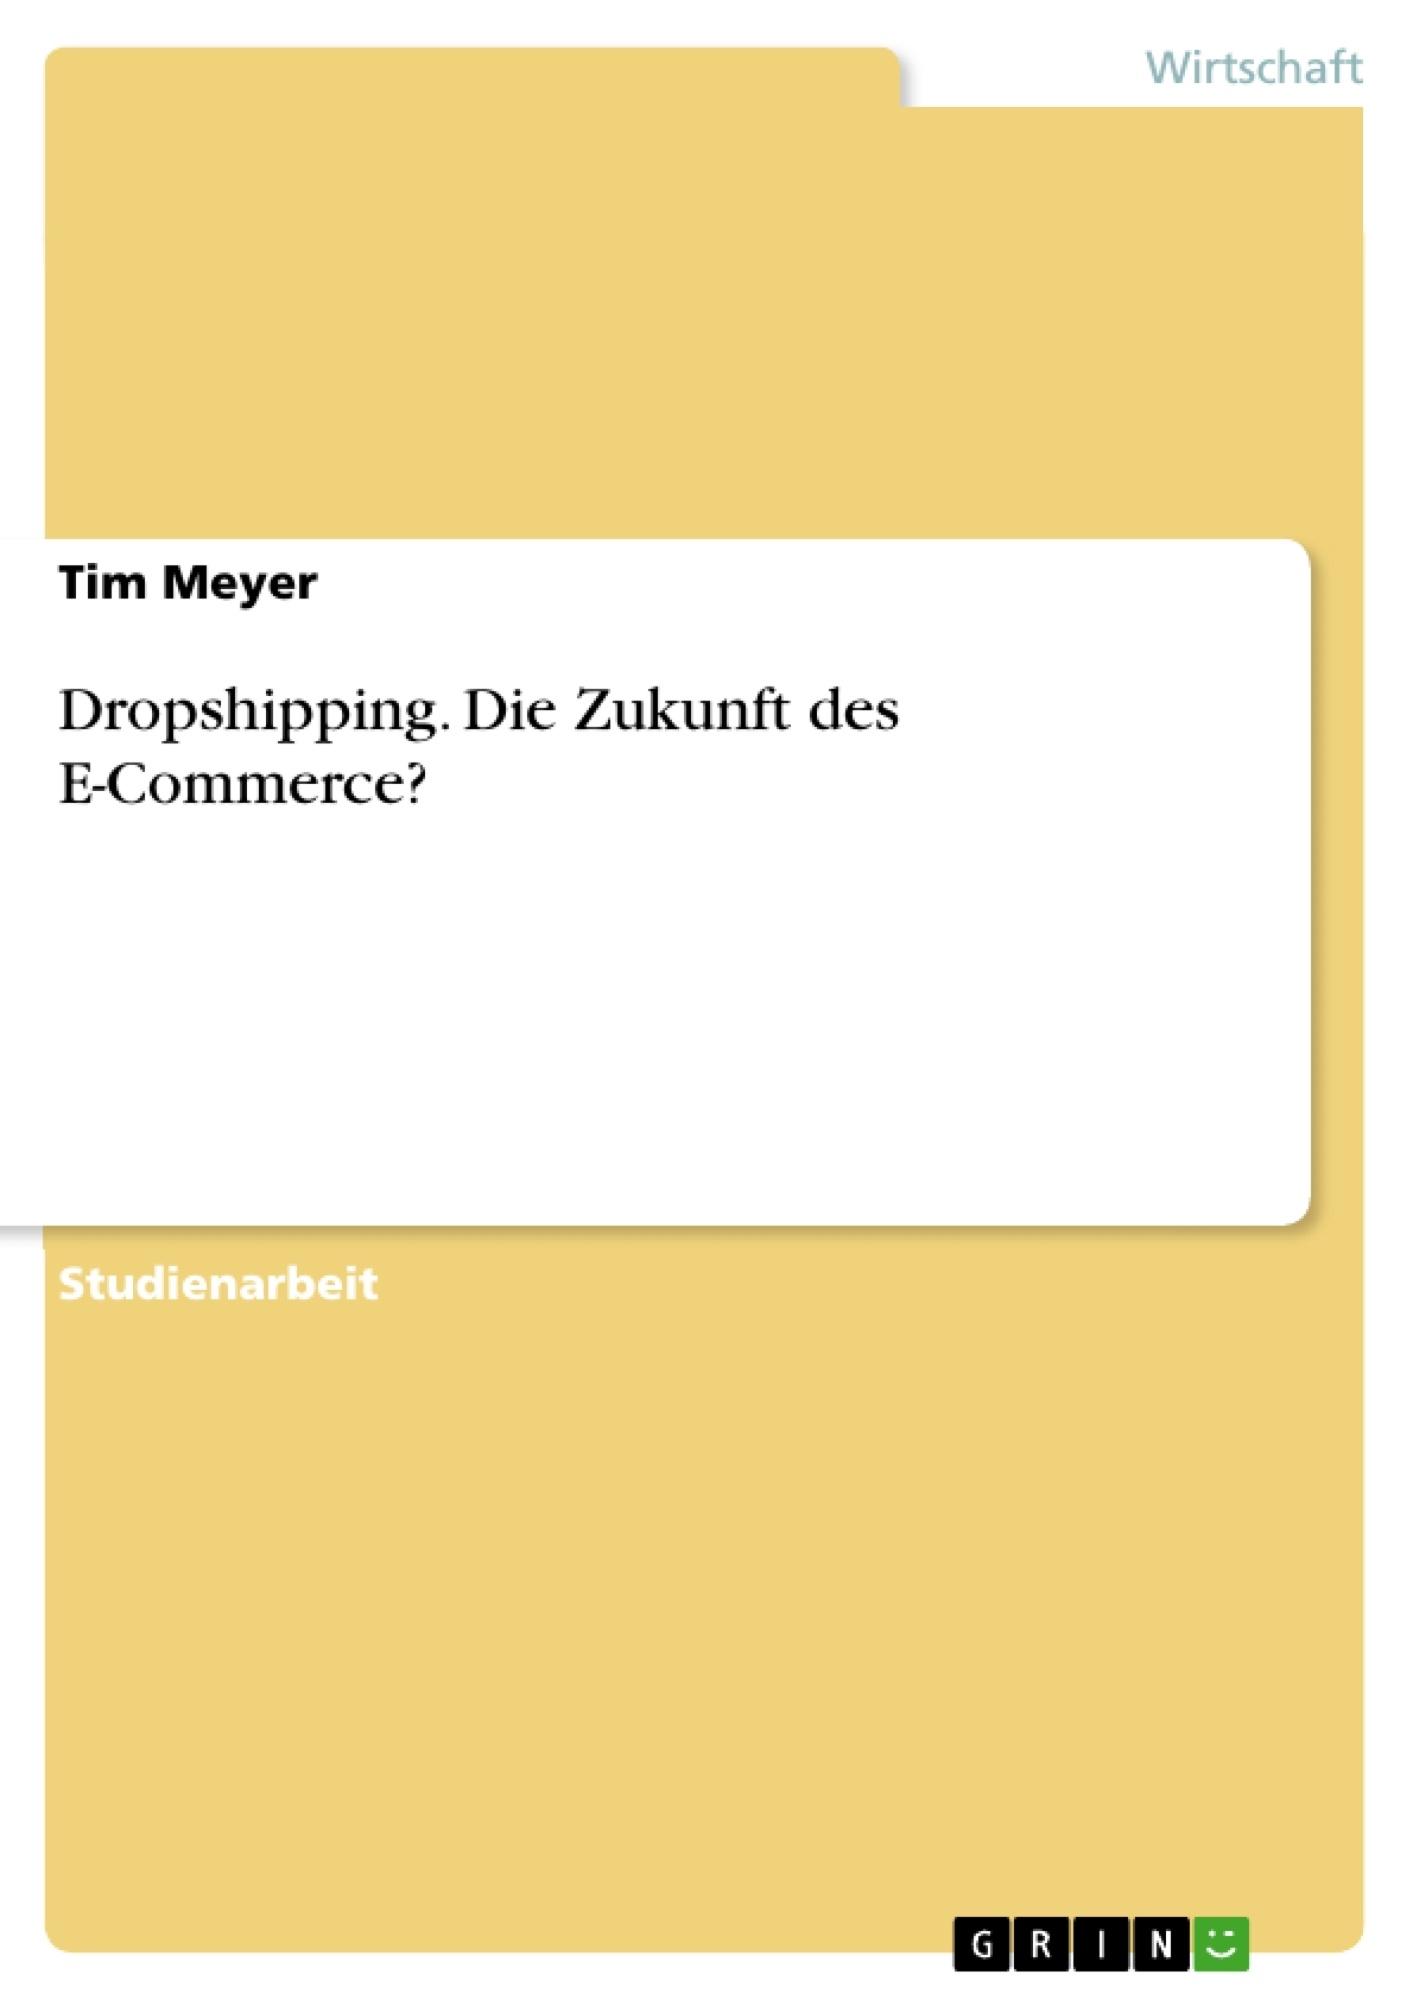 Titel: Dropshipping. Die Zukunft des E-Commerce?